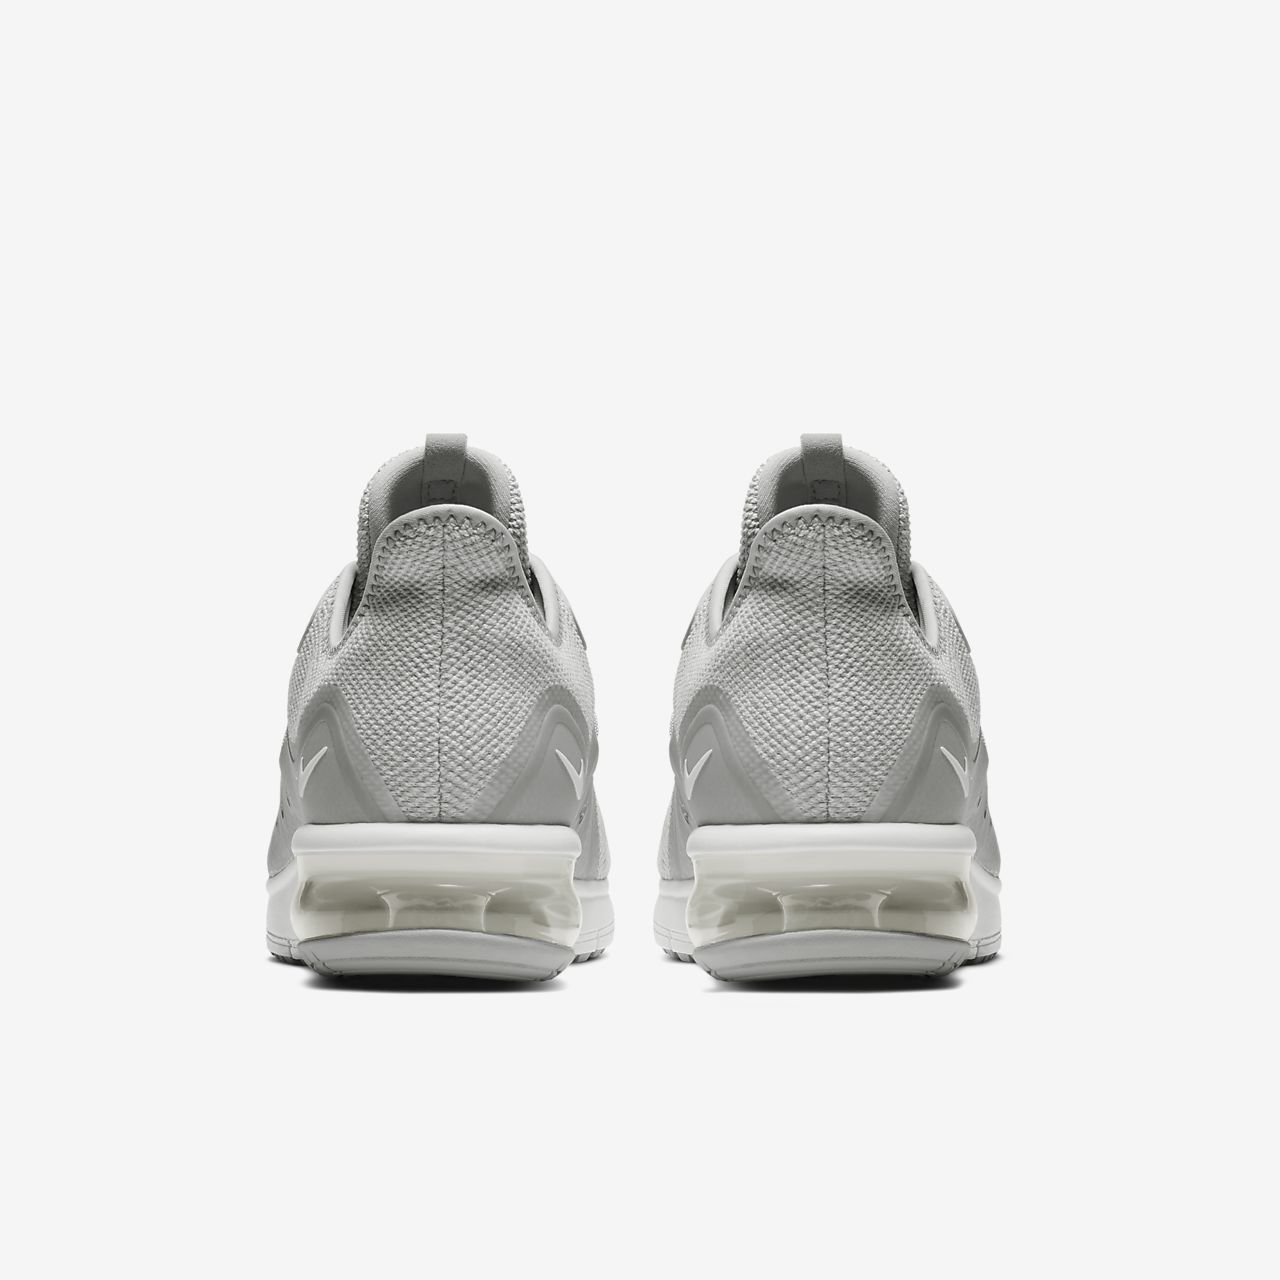 NIKE Air max sequent femme 2 platine blanc gris loup 11